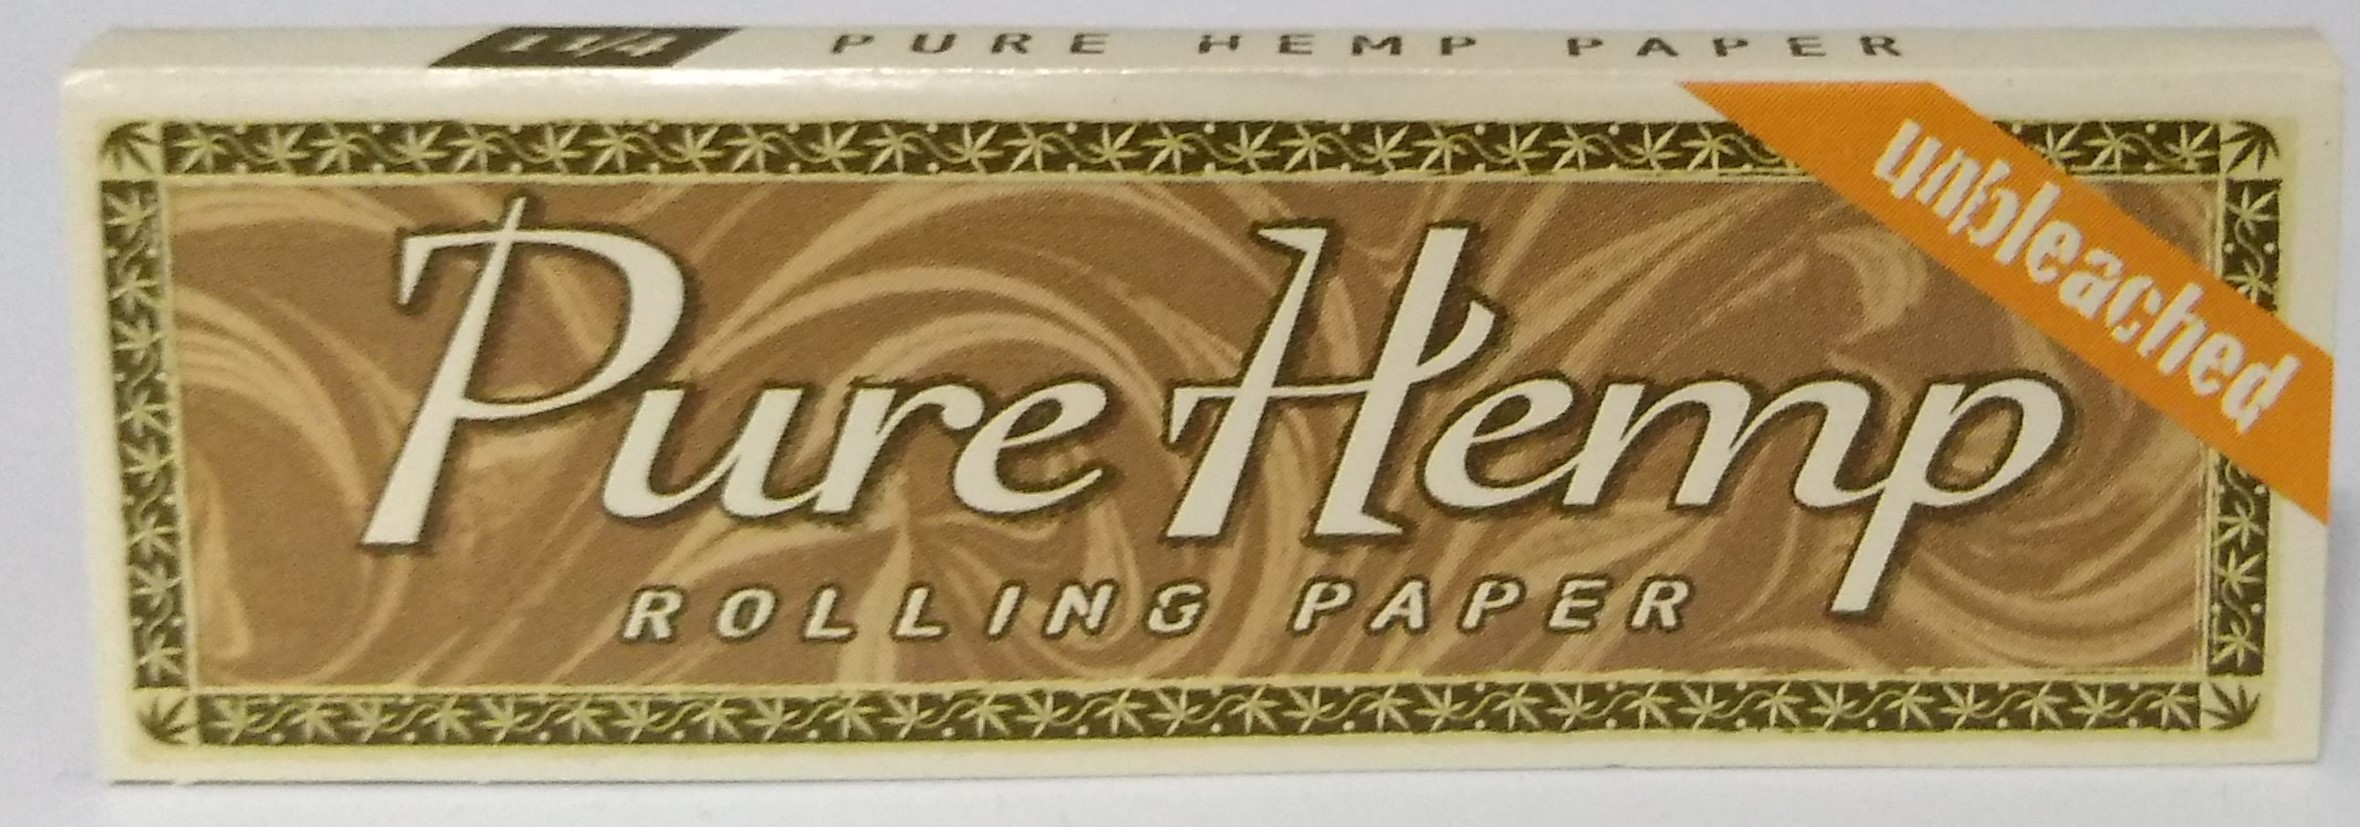 Papel Pure Hemp Umbleached1.1/4